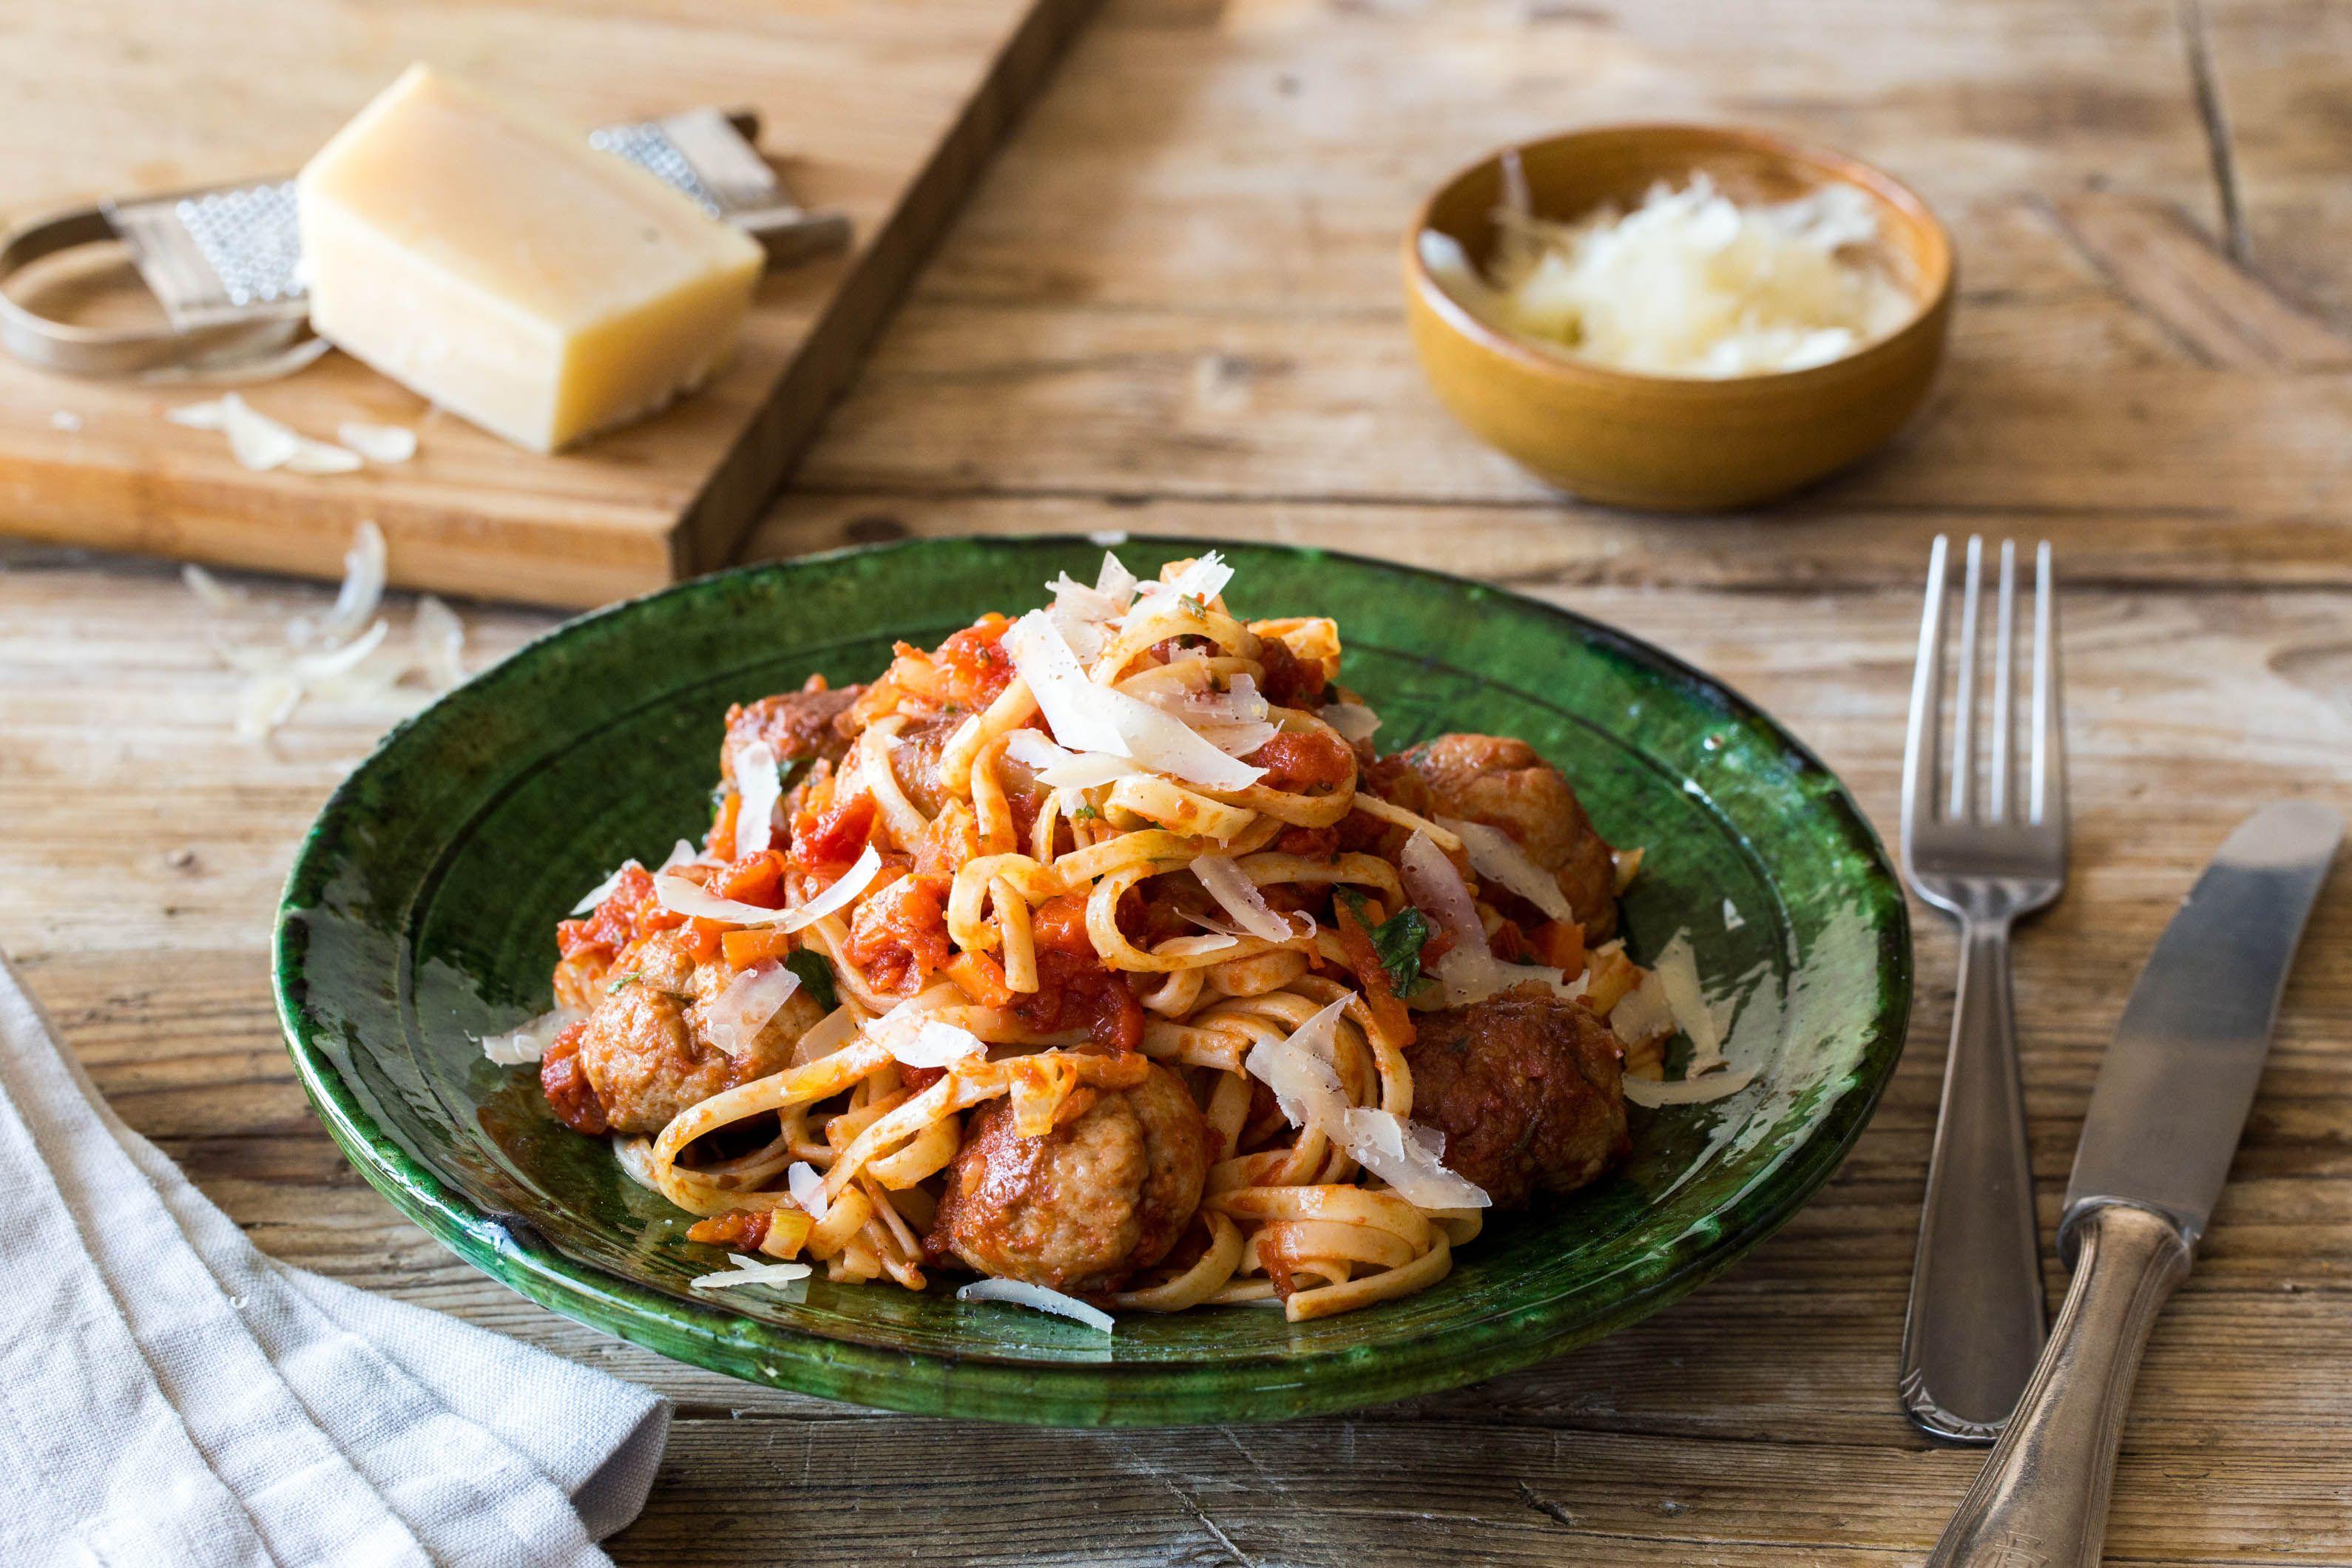 Blue apron meatballs - Swingball Meatballs With Smoked Tomato Linguine Recipe Hellofresh